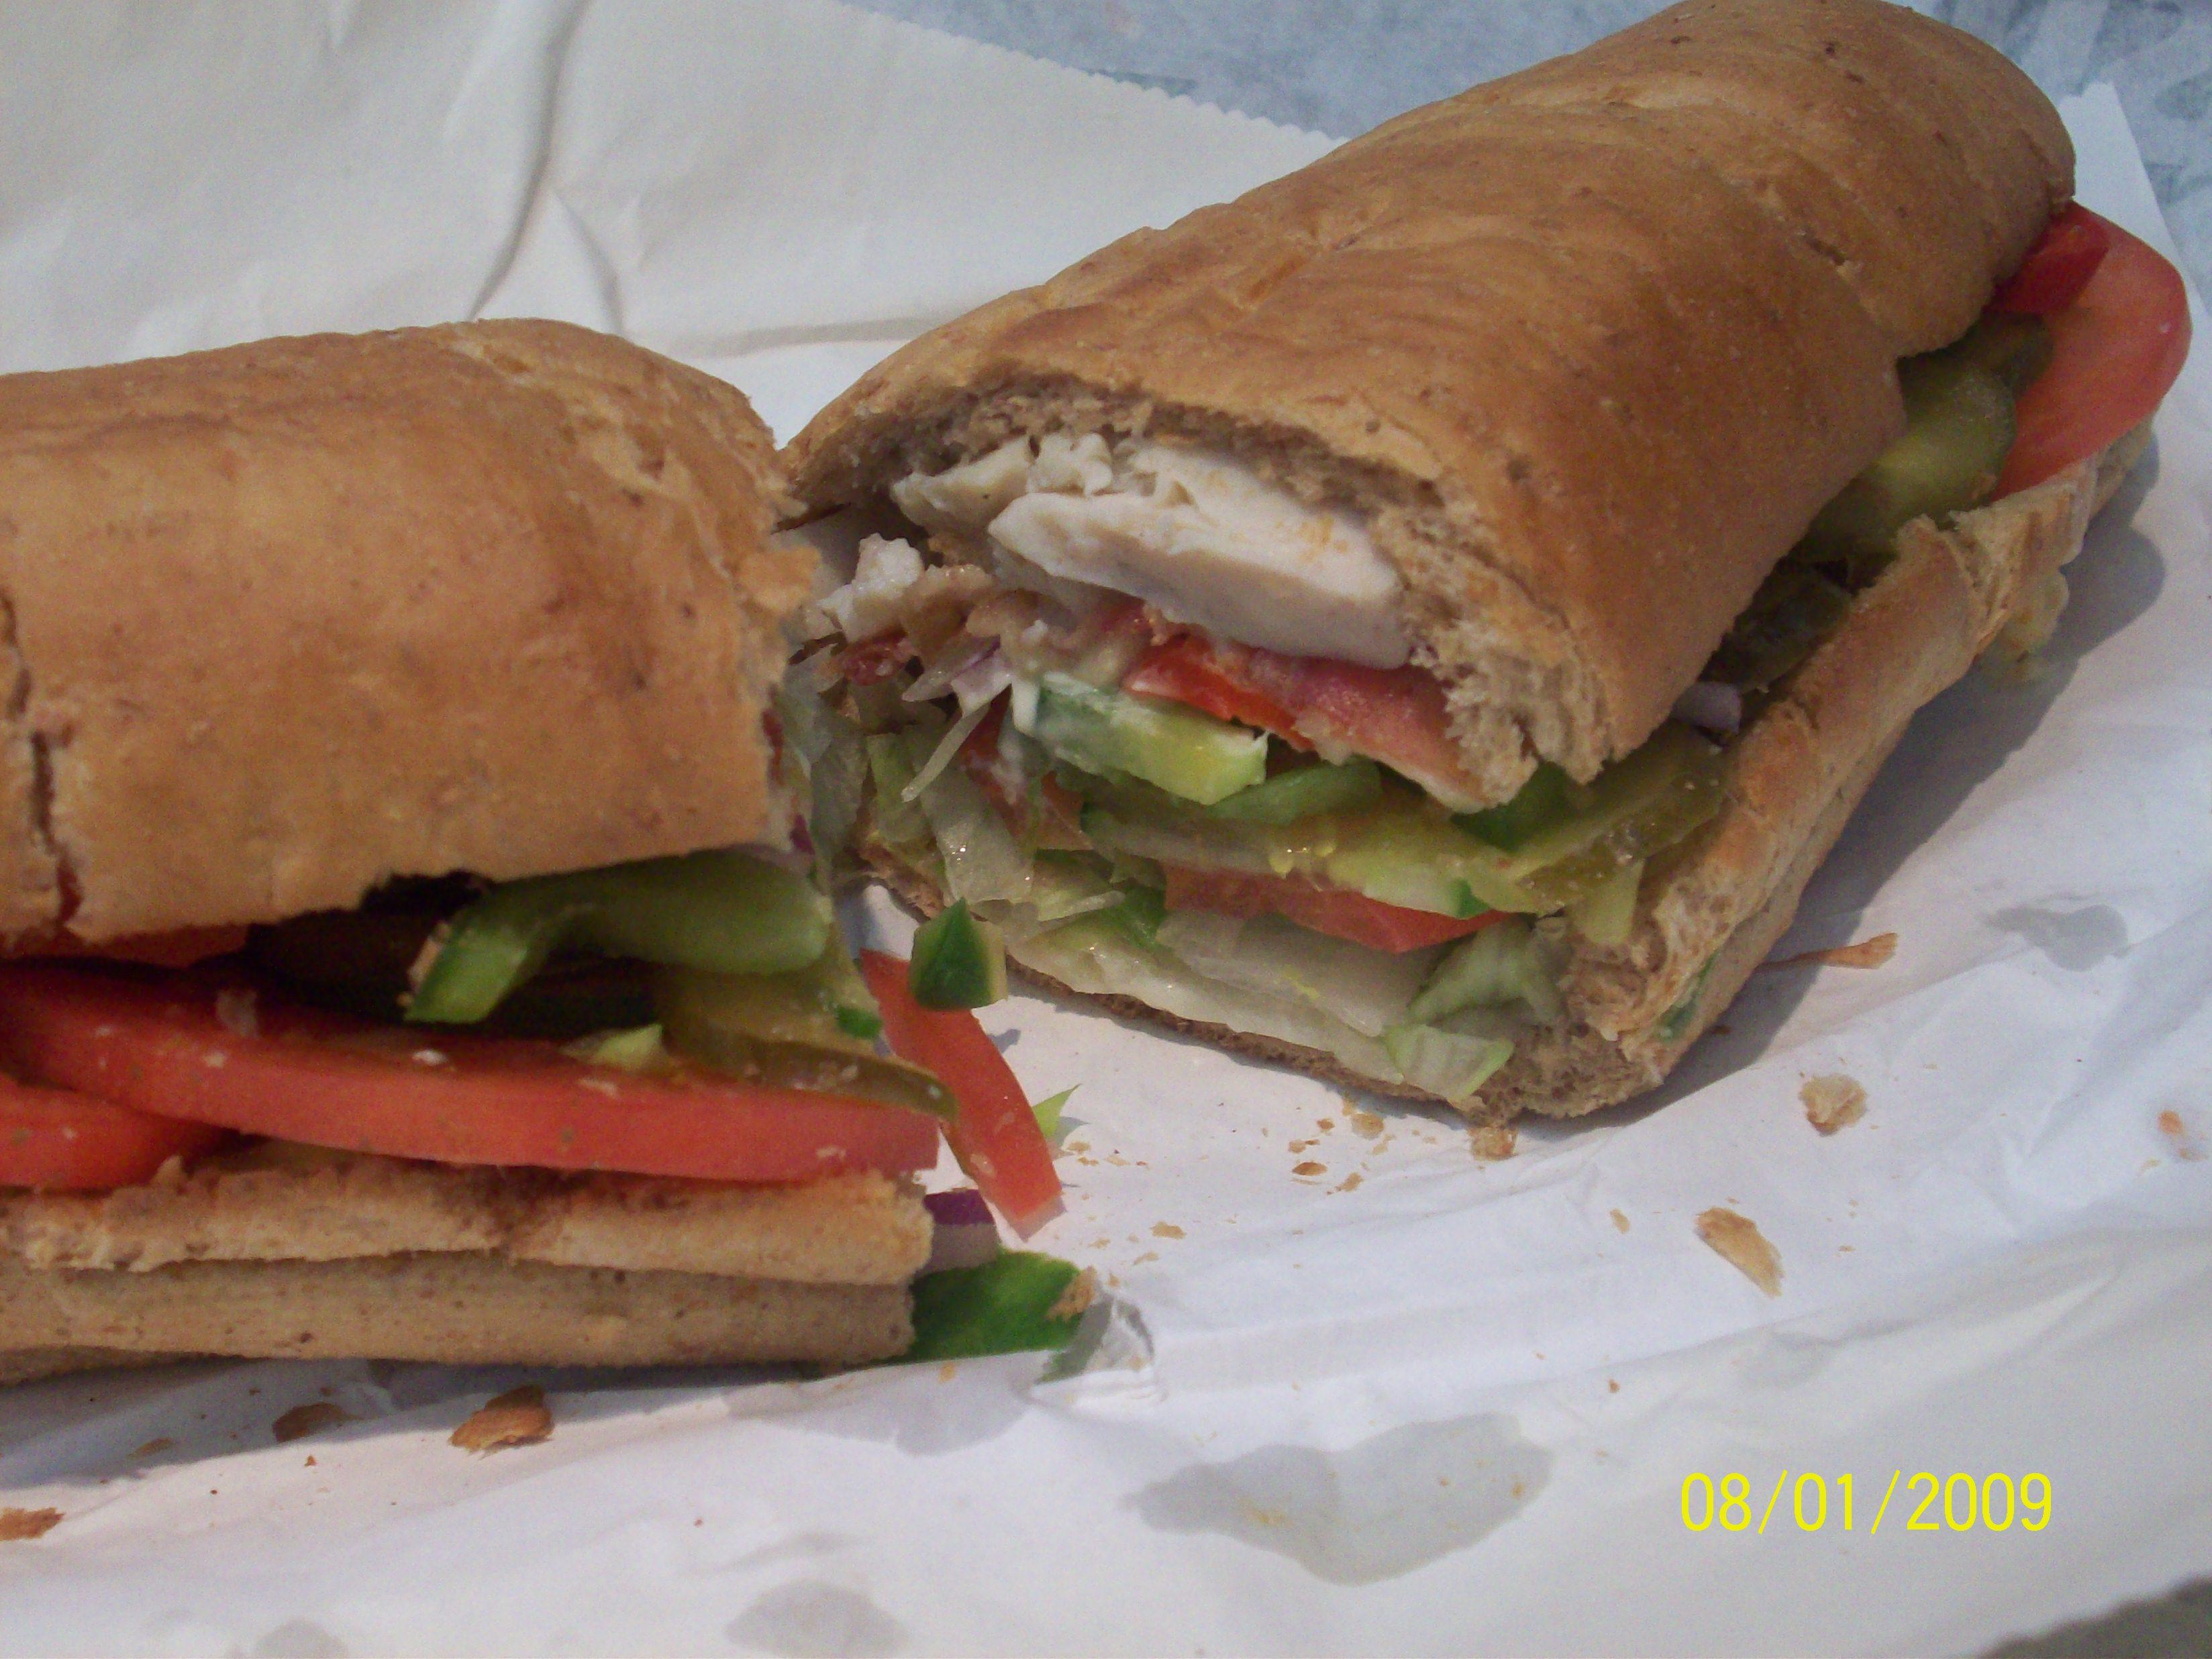 https://foodloader.net/cutie_2009-01-09_Subway_Chicken_&_Bacon_Ranch_Sandwich.jpg